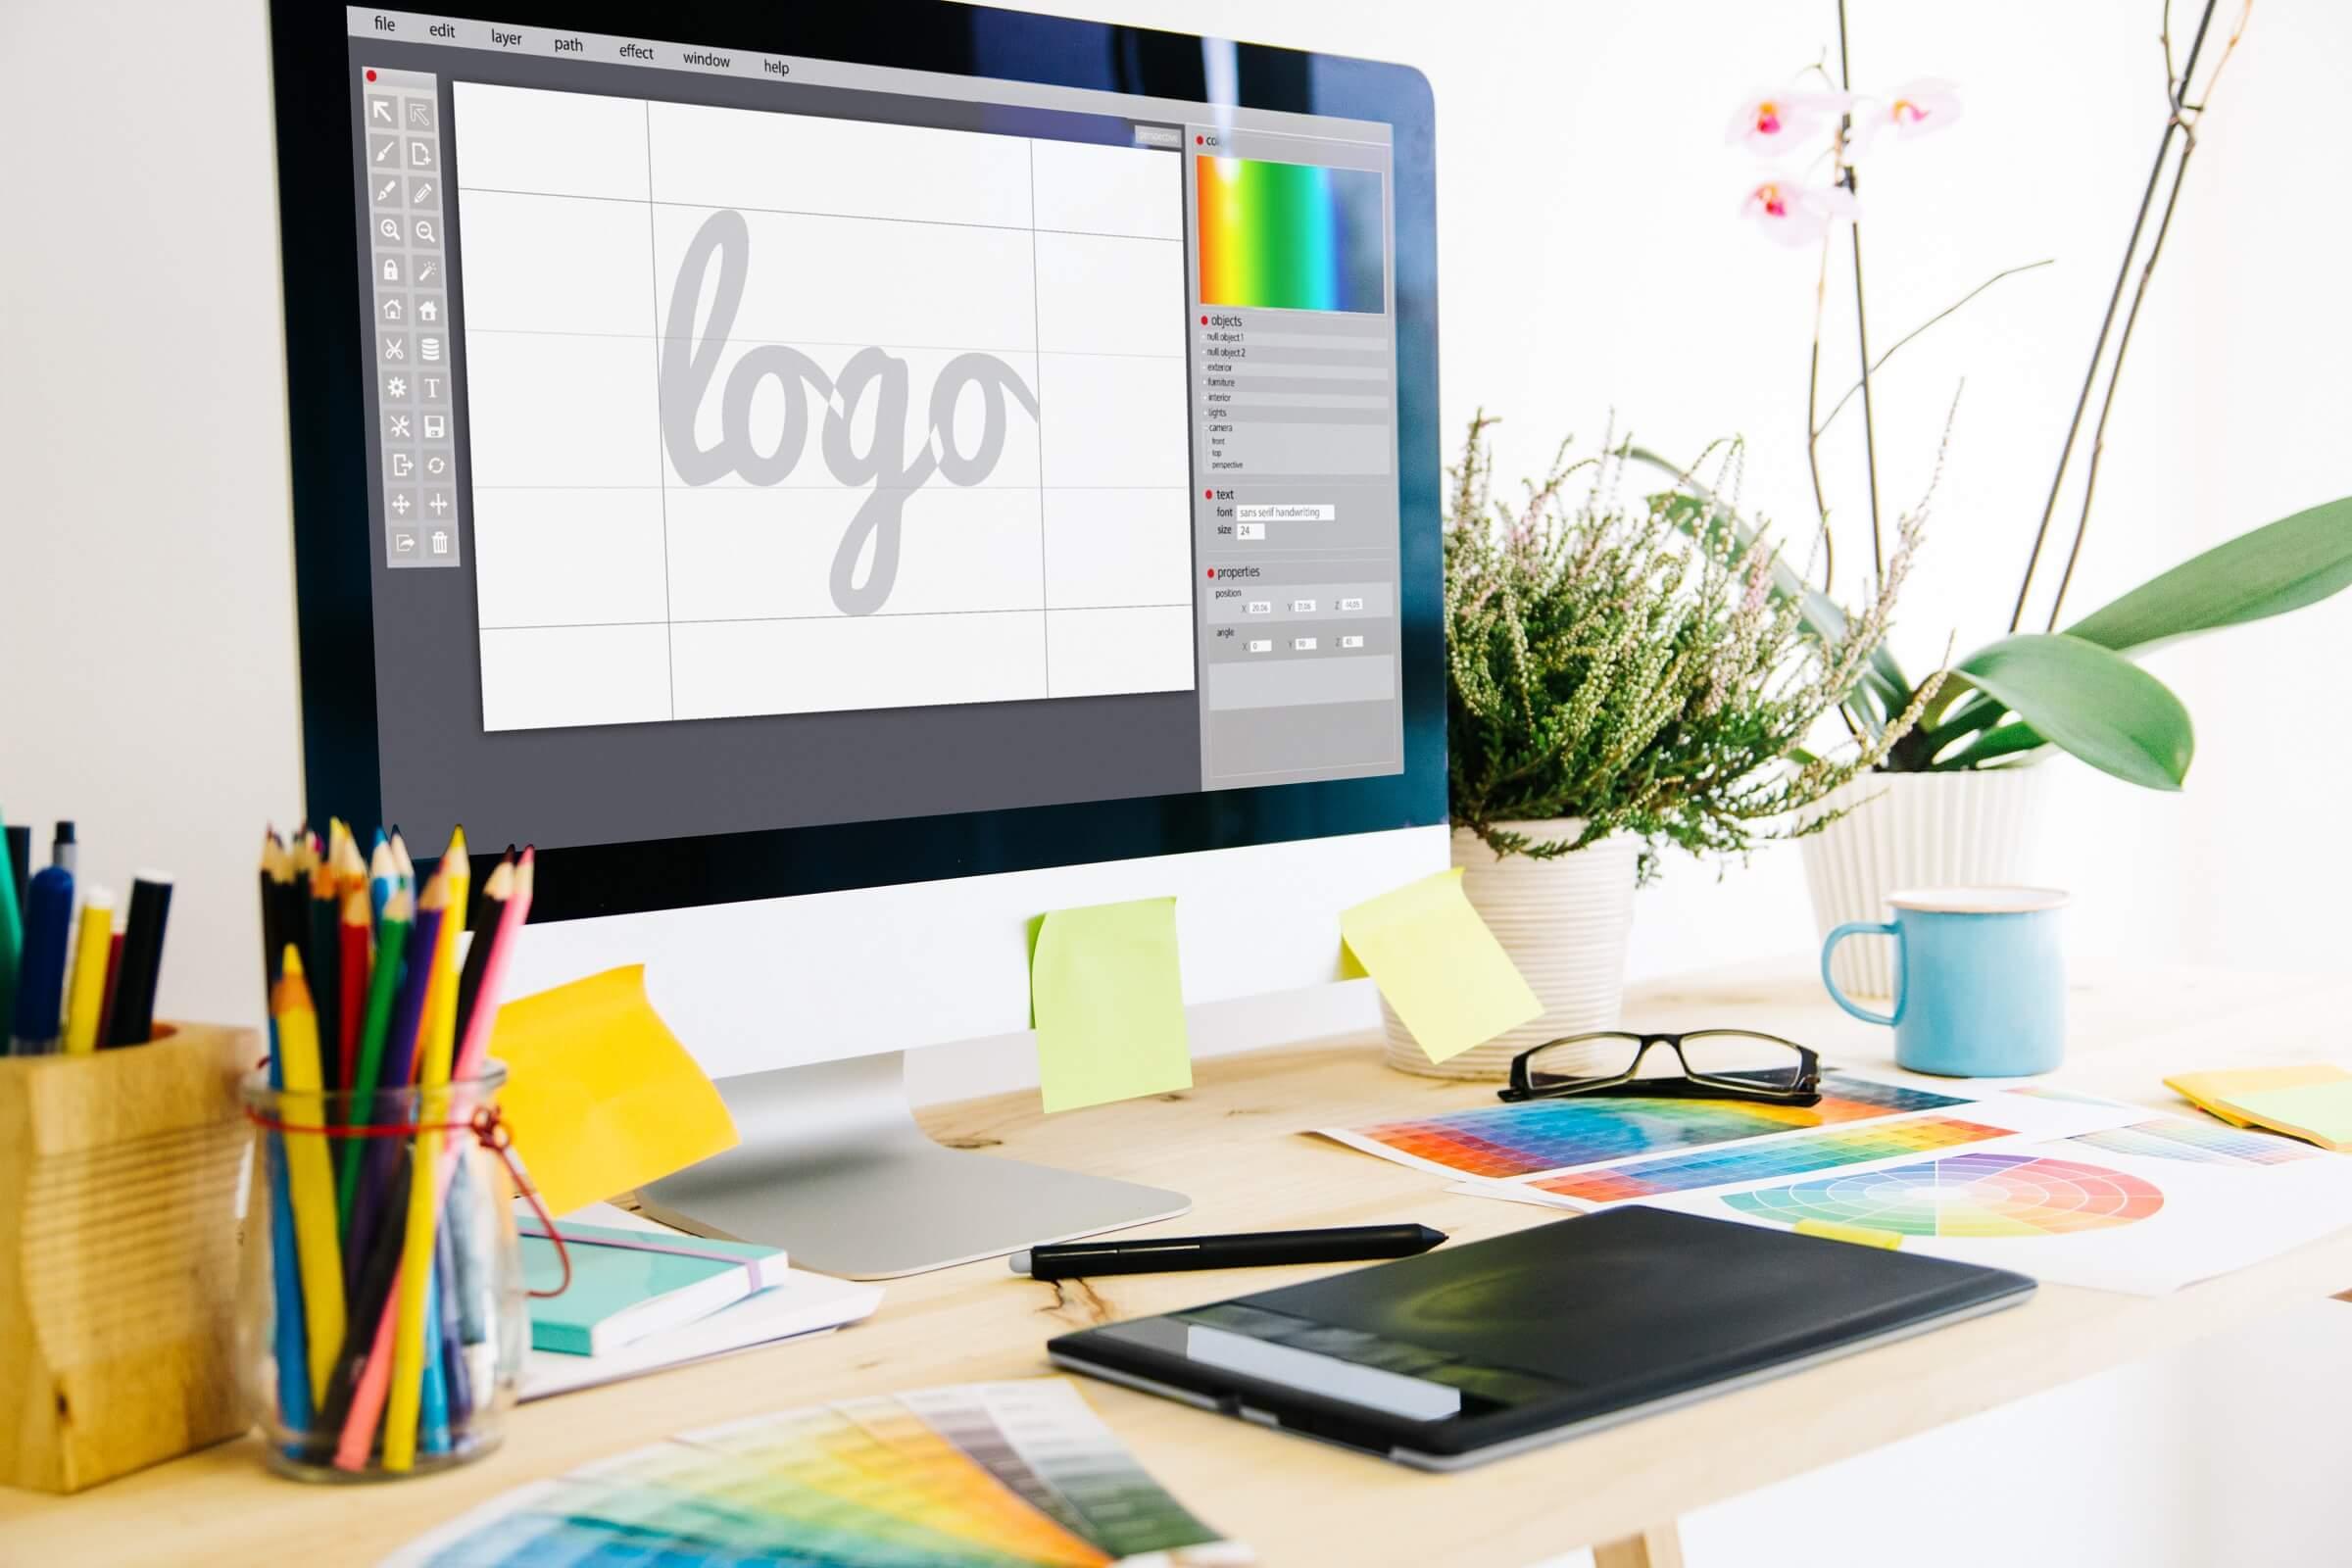 mac computer on a desk depicting an adobe creative program Επαγγελματικά Σεμινάρια Graphic Design